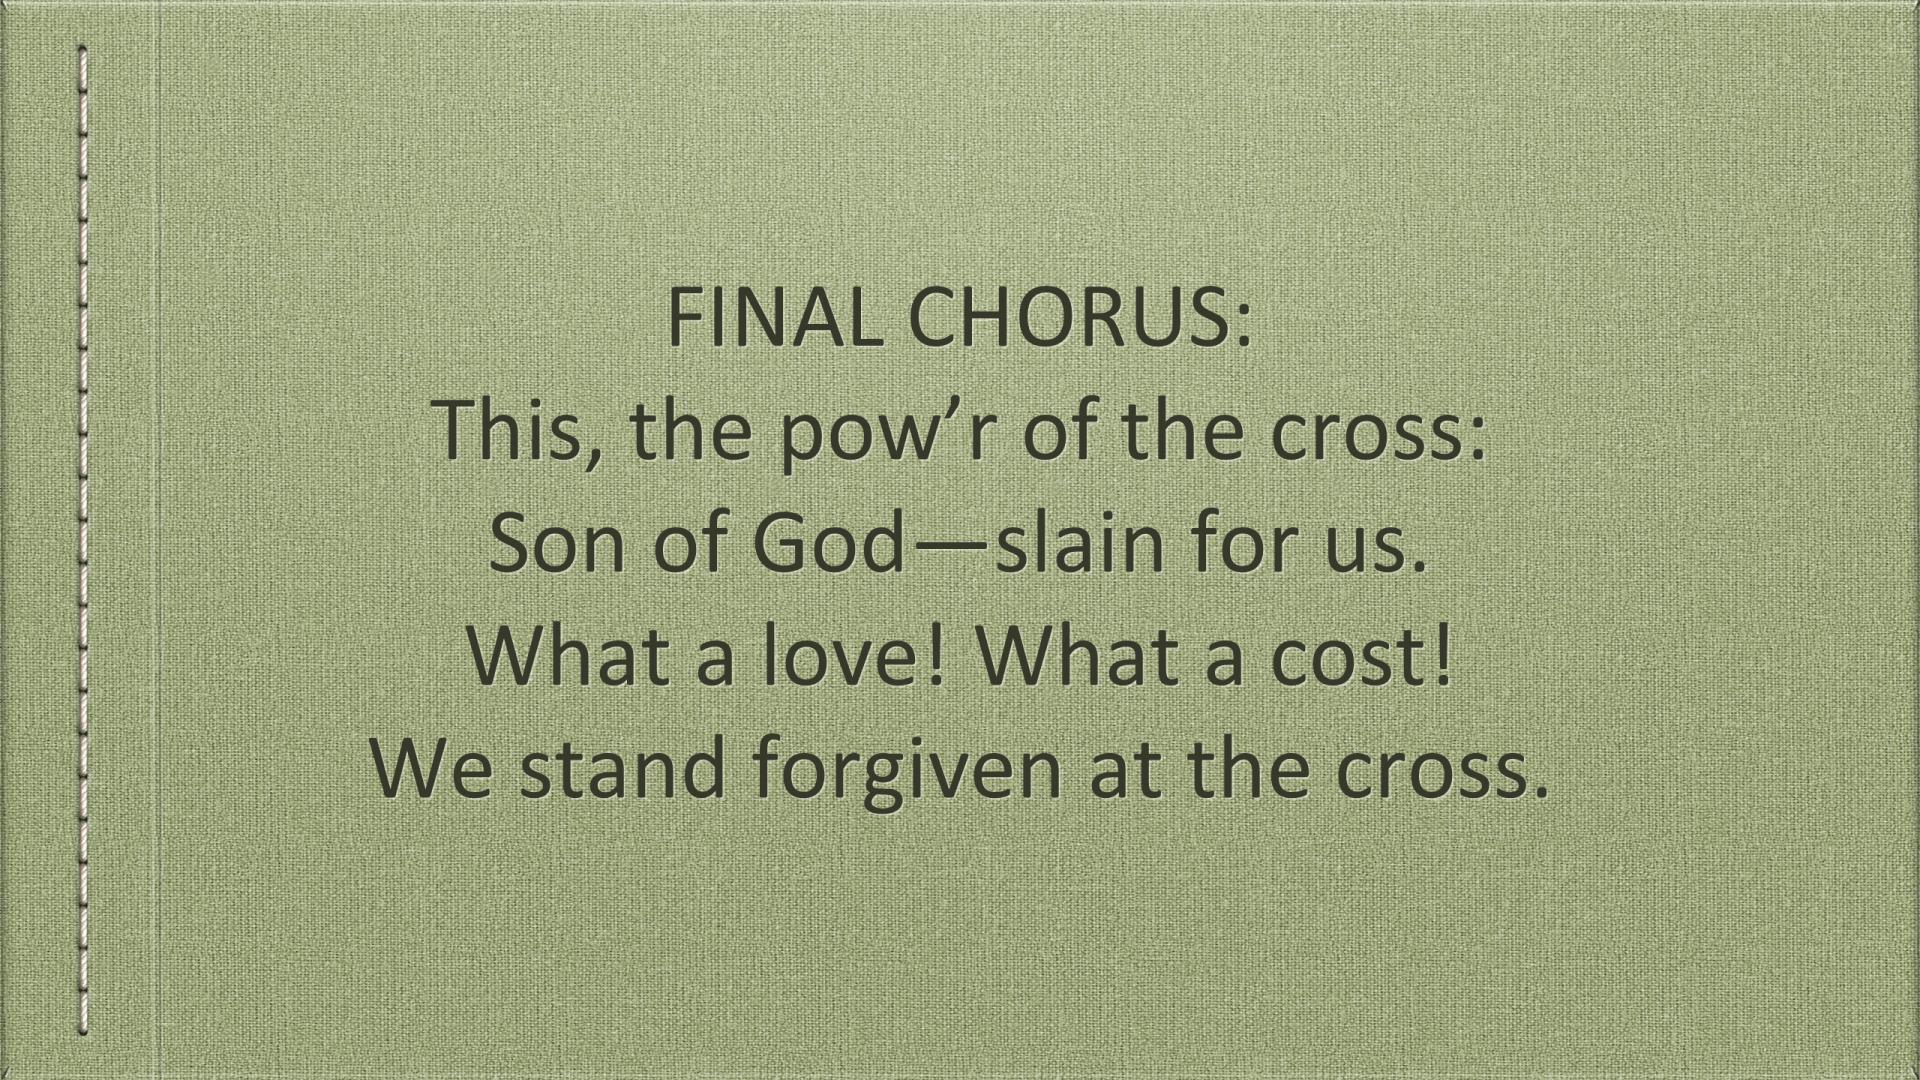 GCM-52 - The Hands Of God, Face Of God, And Feet Of God - In A Manger (13)